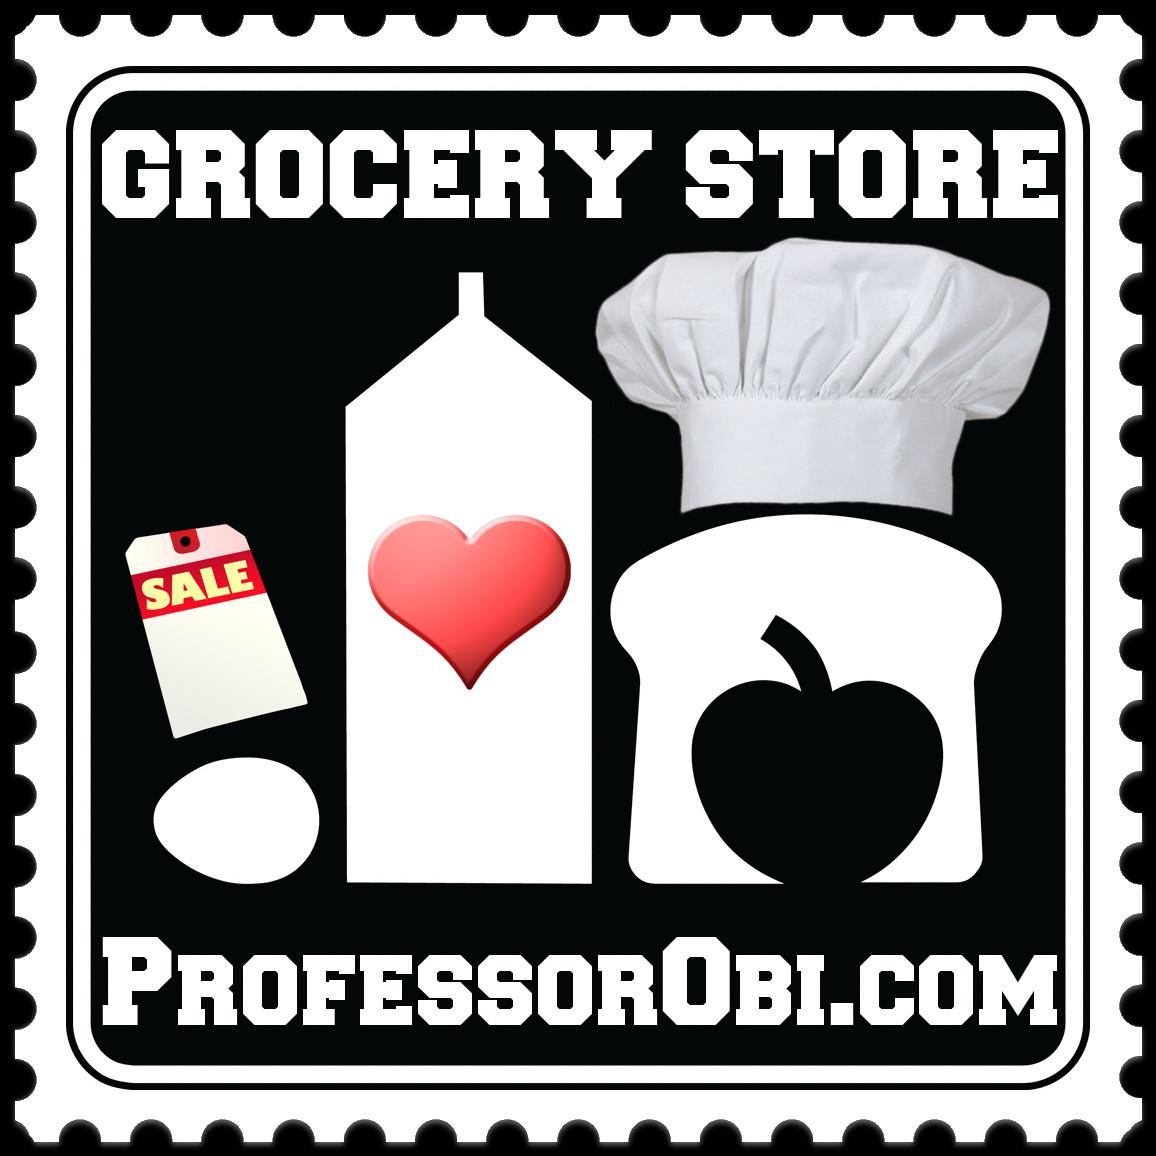 Professor Obi | Online Food Store